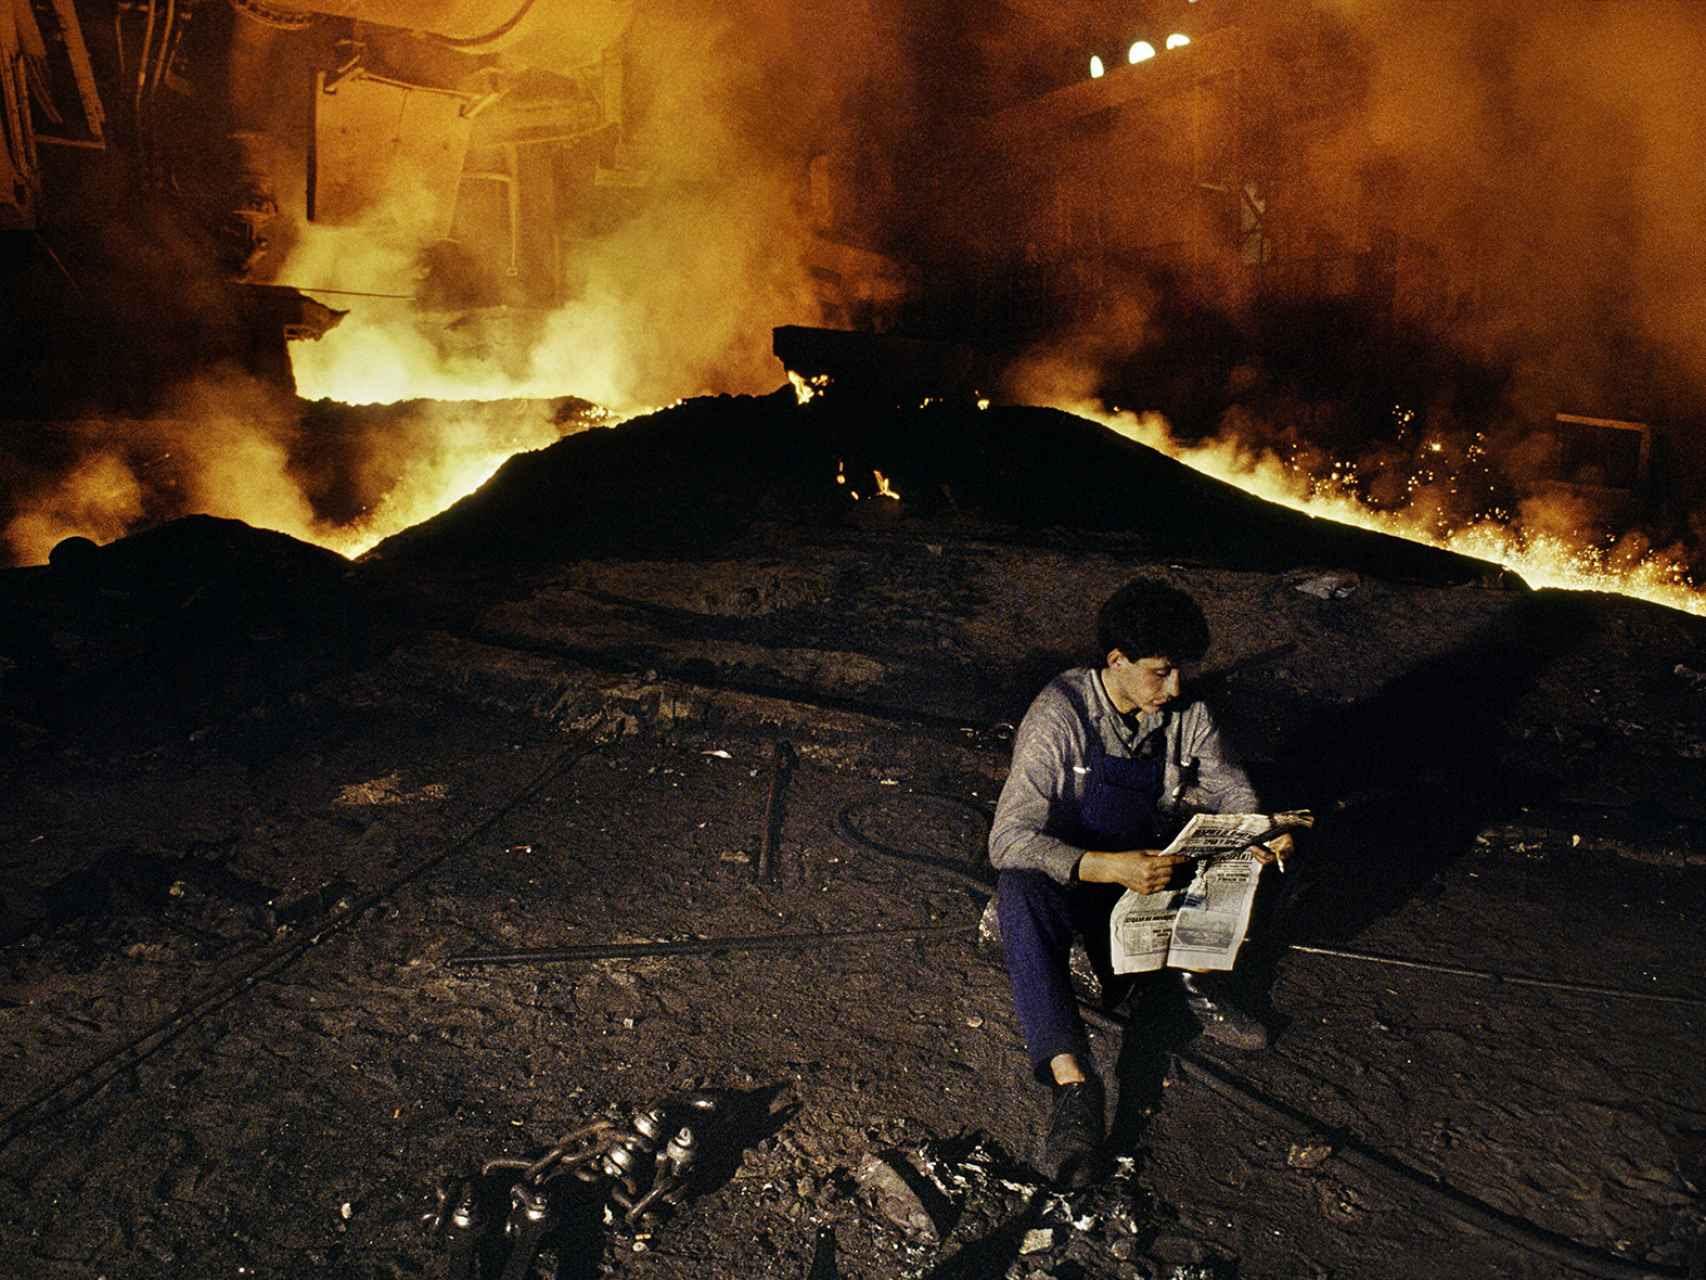 Serbia, Steve McCurry.